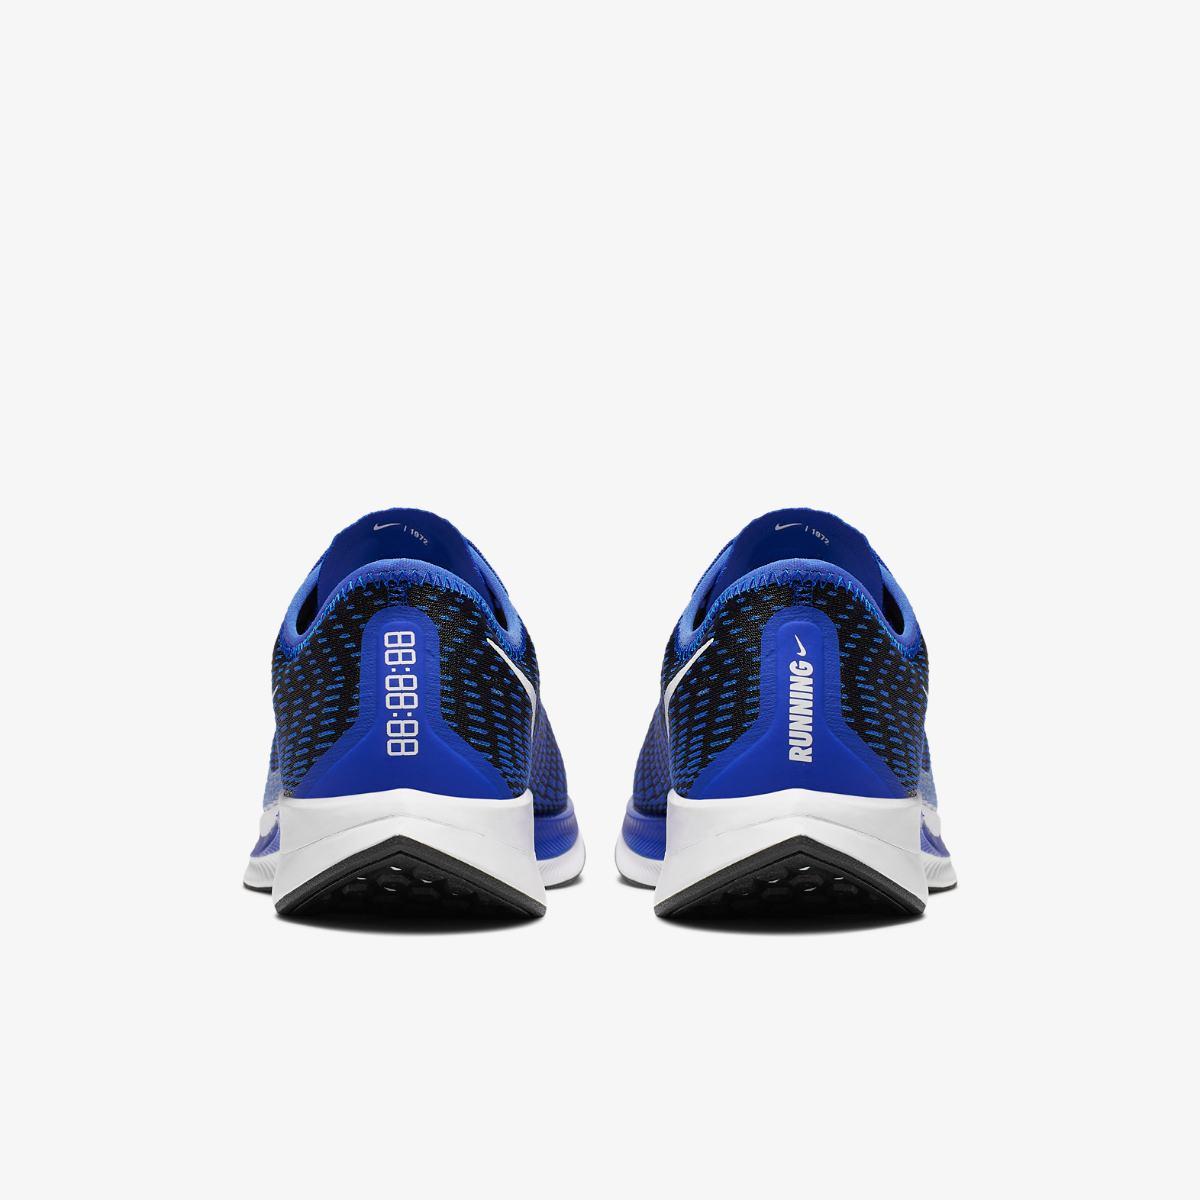 Nike Zoom Pegasus Turbo 2 Review – Solereview